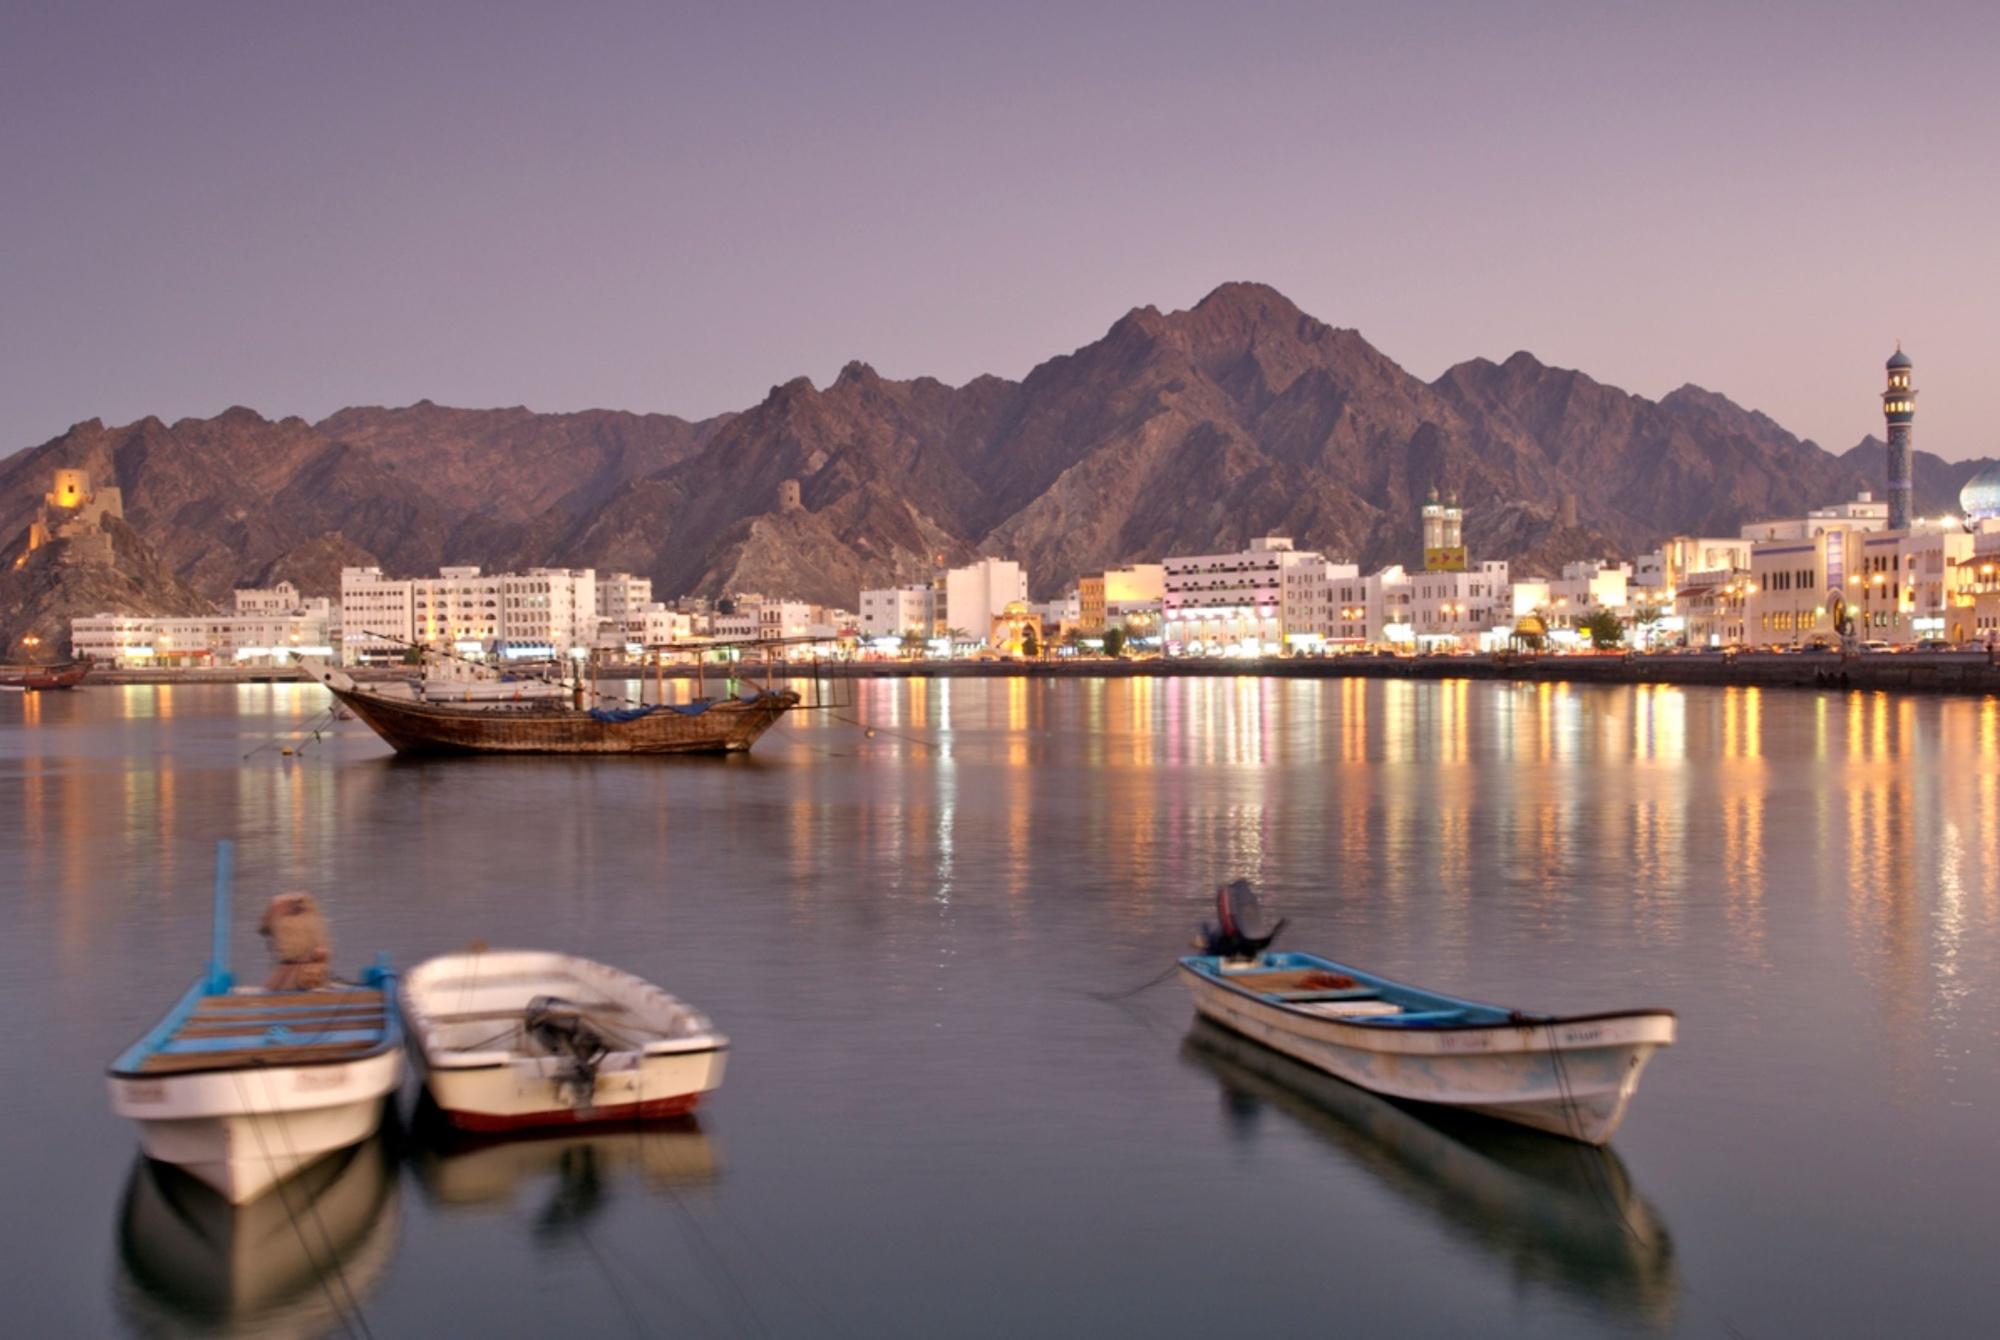 Muscat, capital of Oman